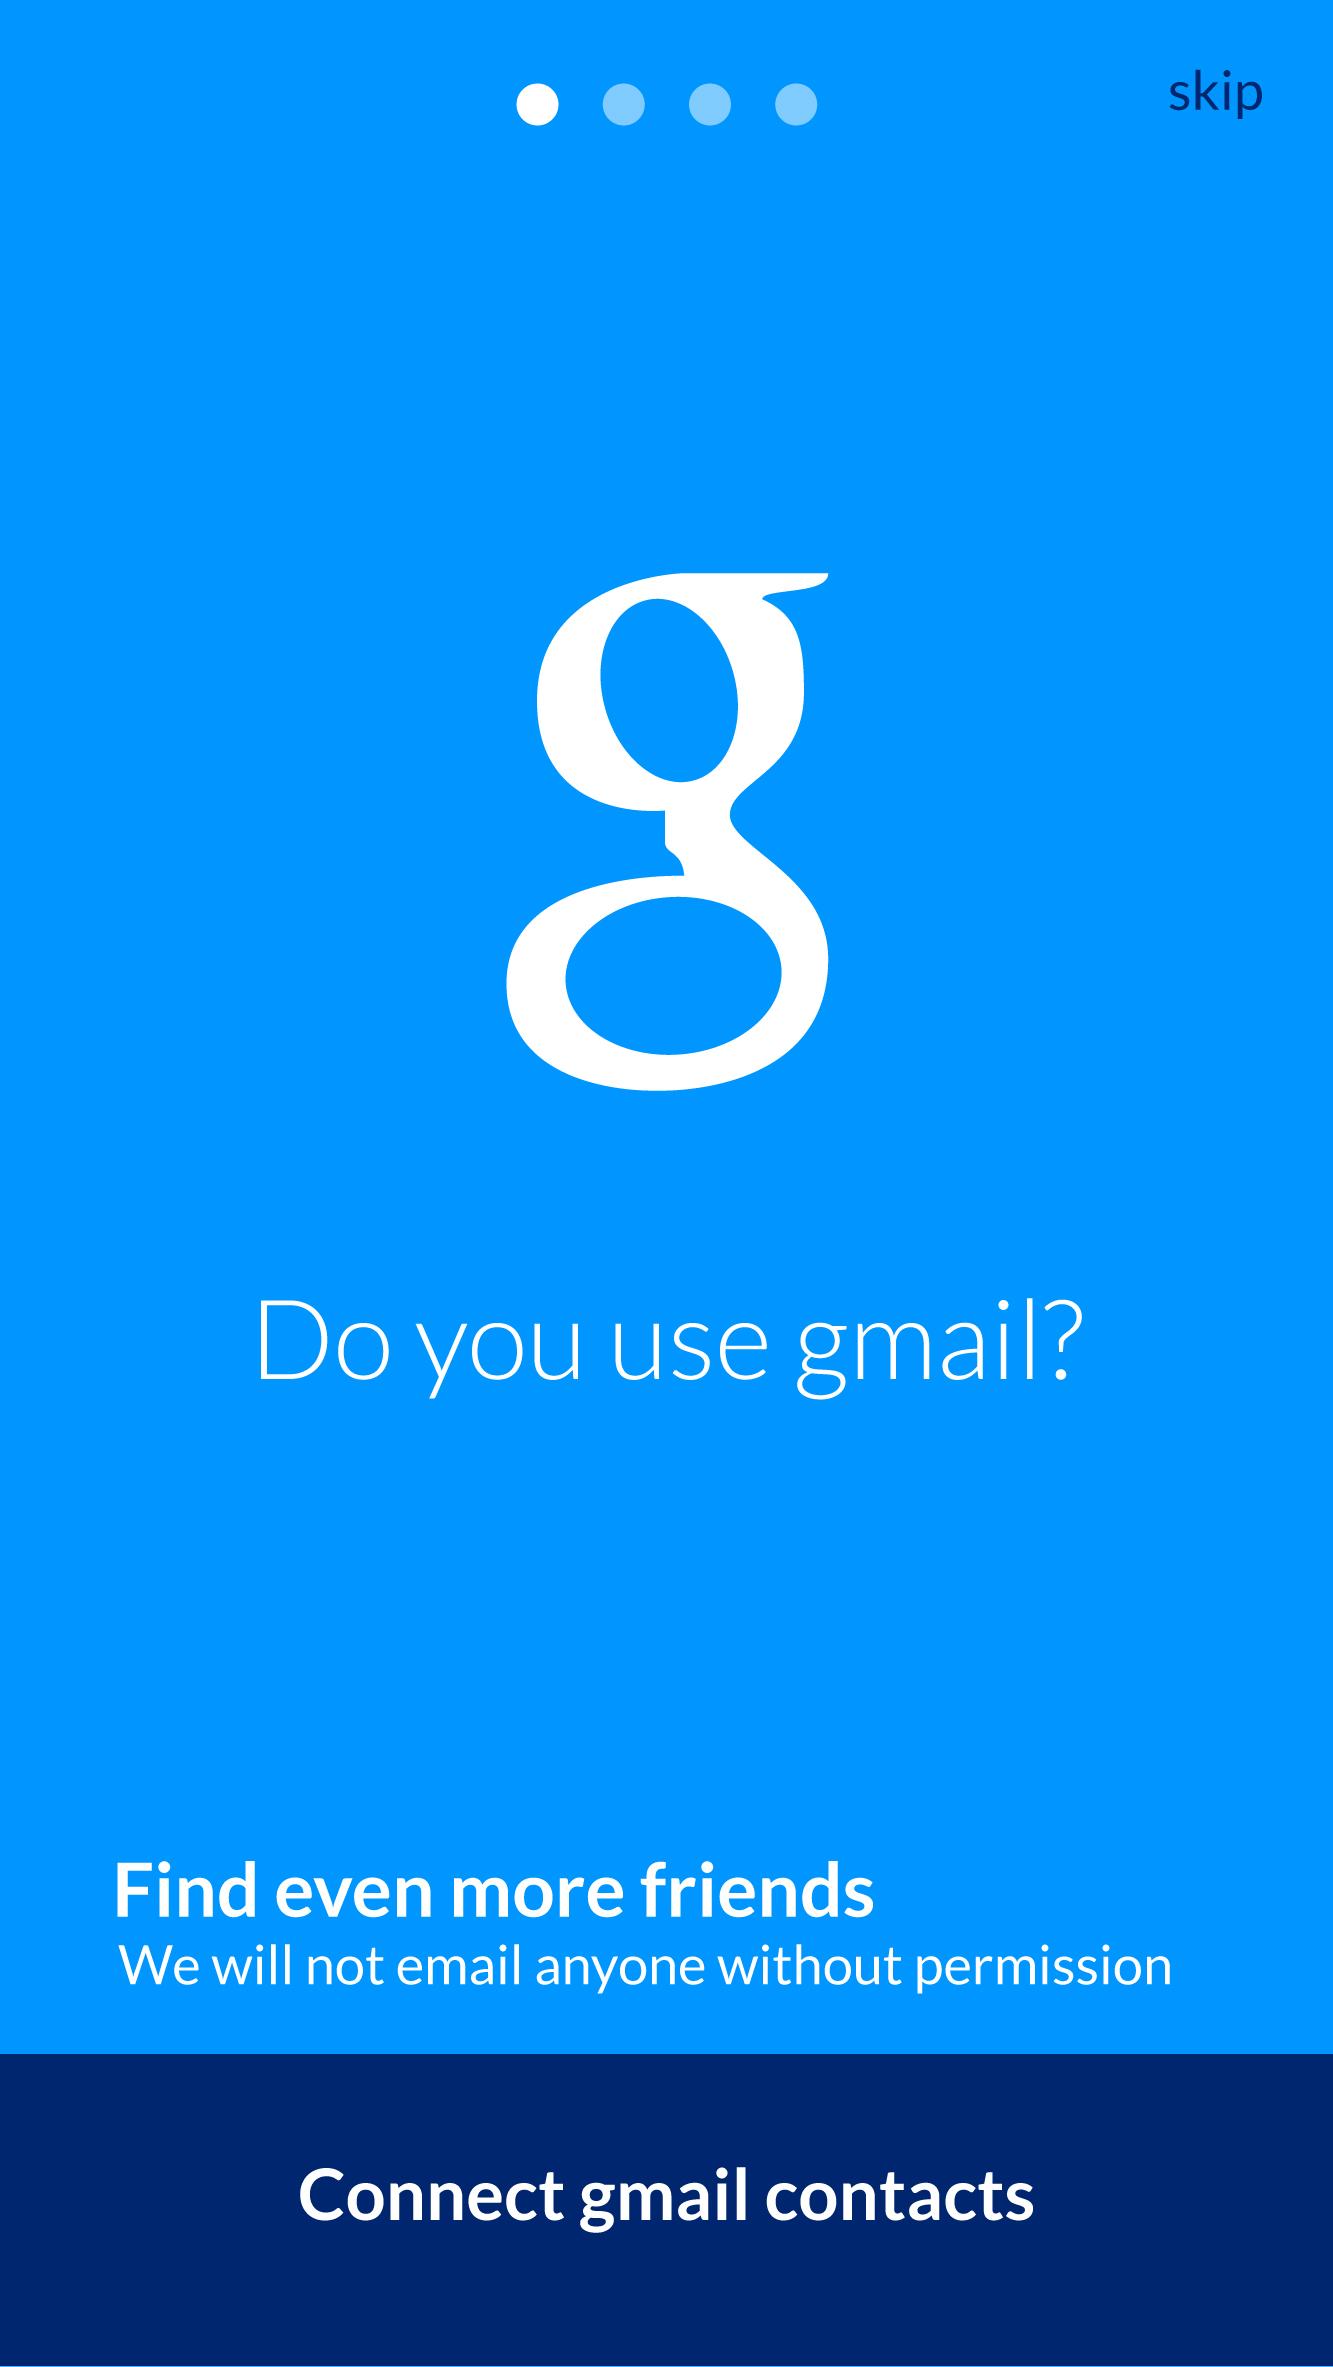 Silo_[OB] Gmail Contact